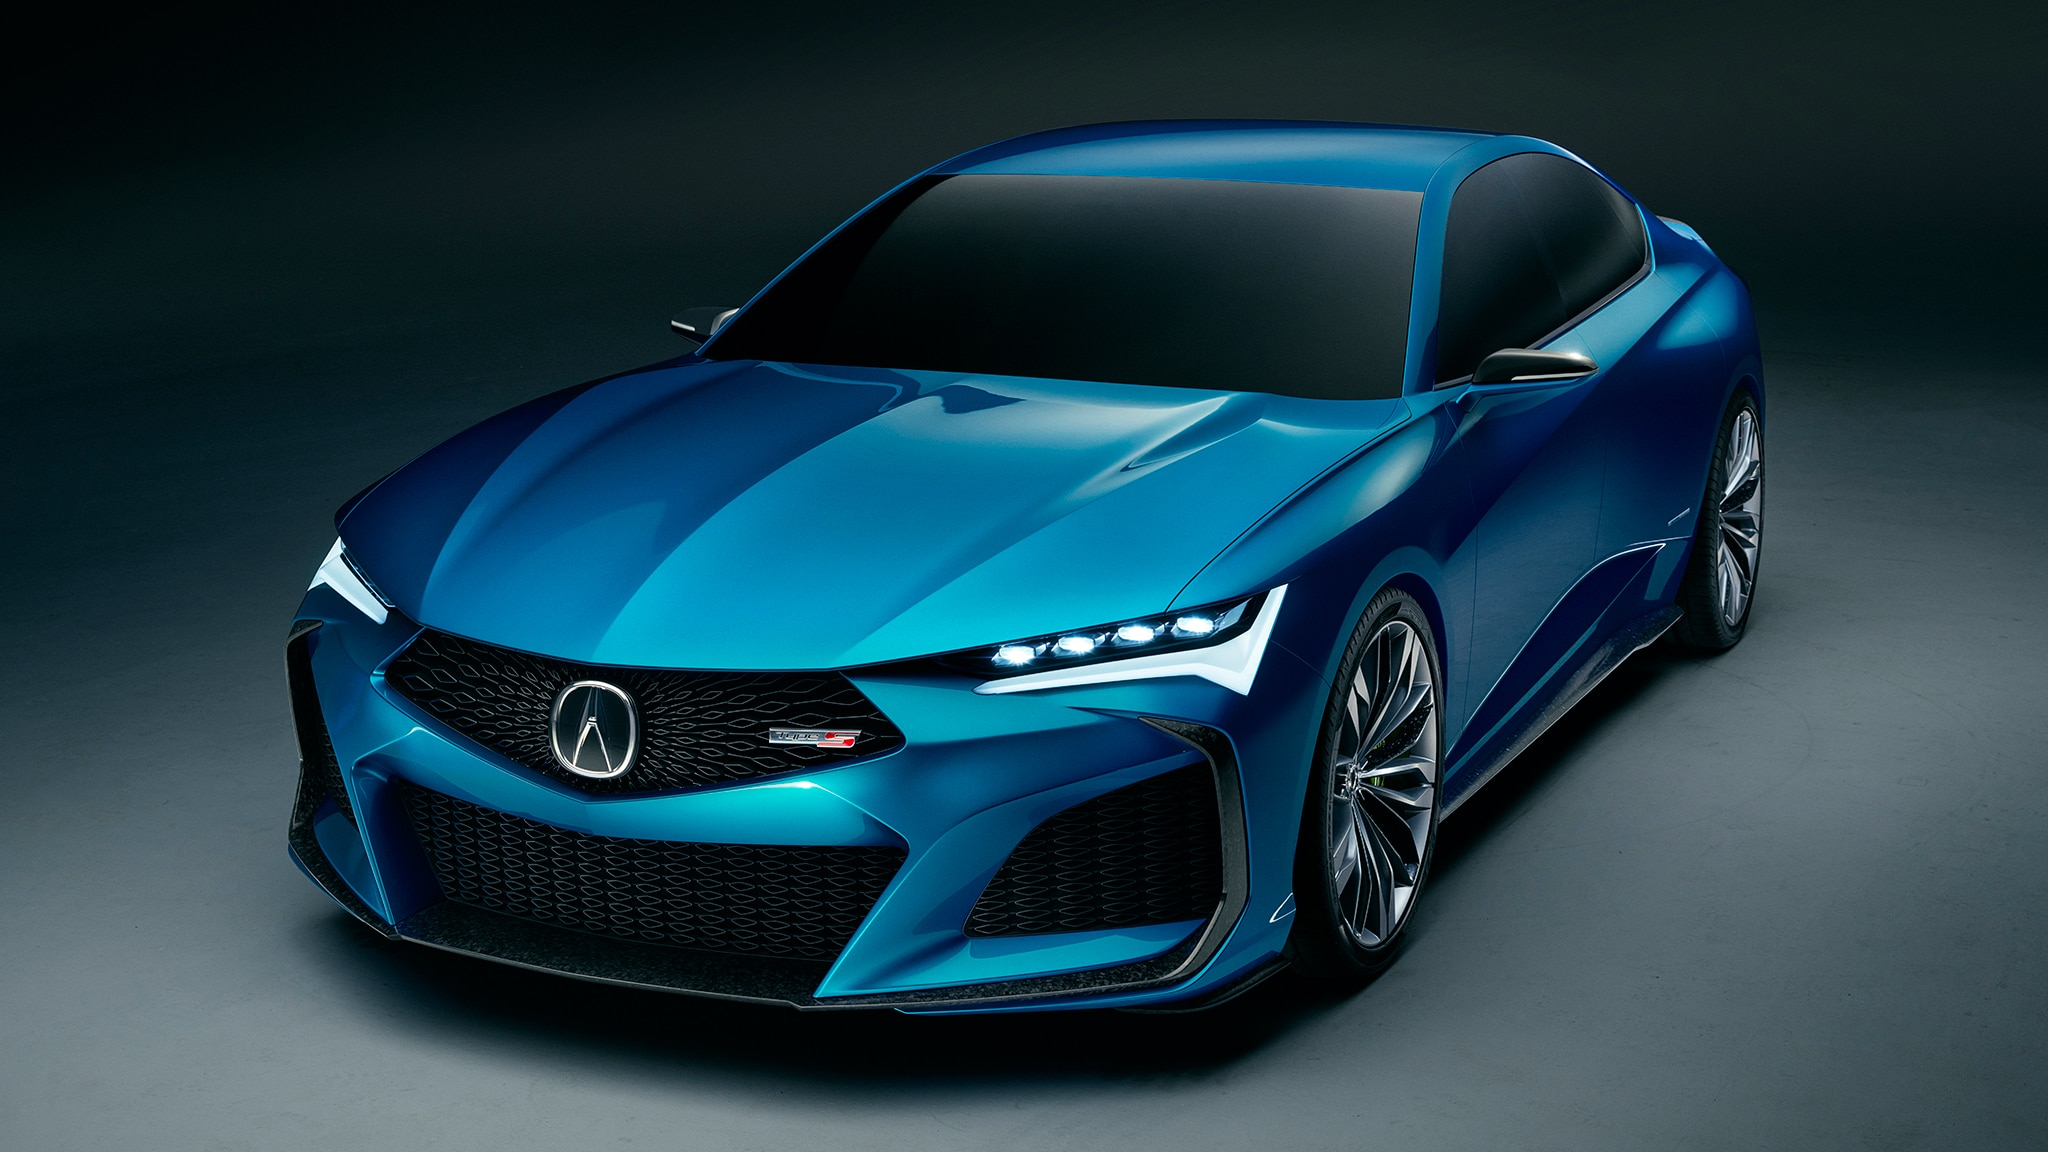 Acura Type S Concept Promises Renewed Focus on Performance ...